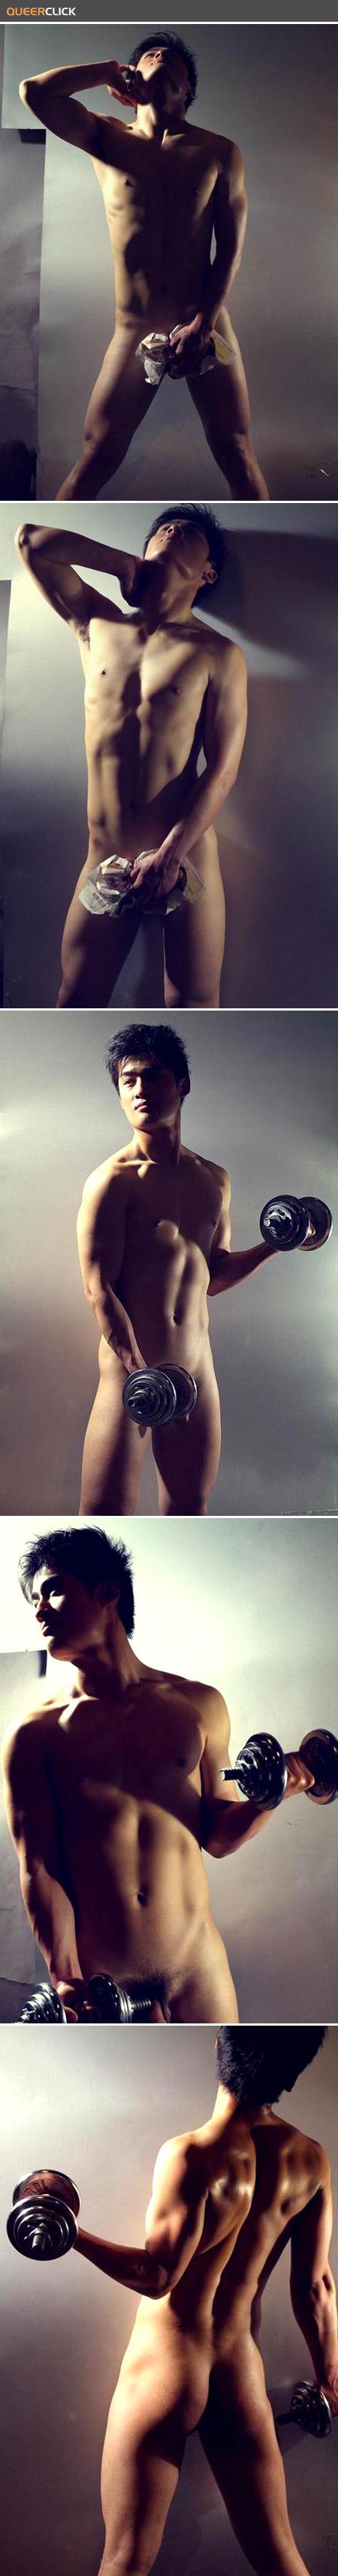 sexy_asian_man_185